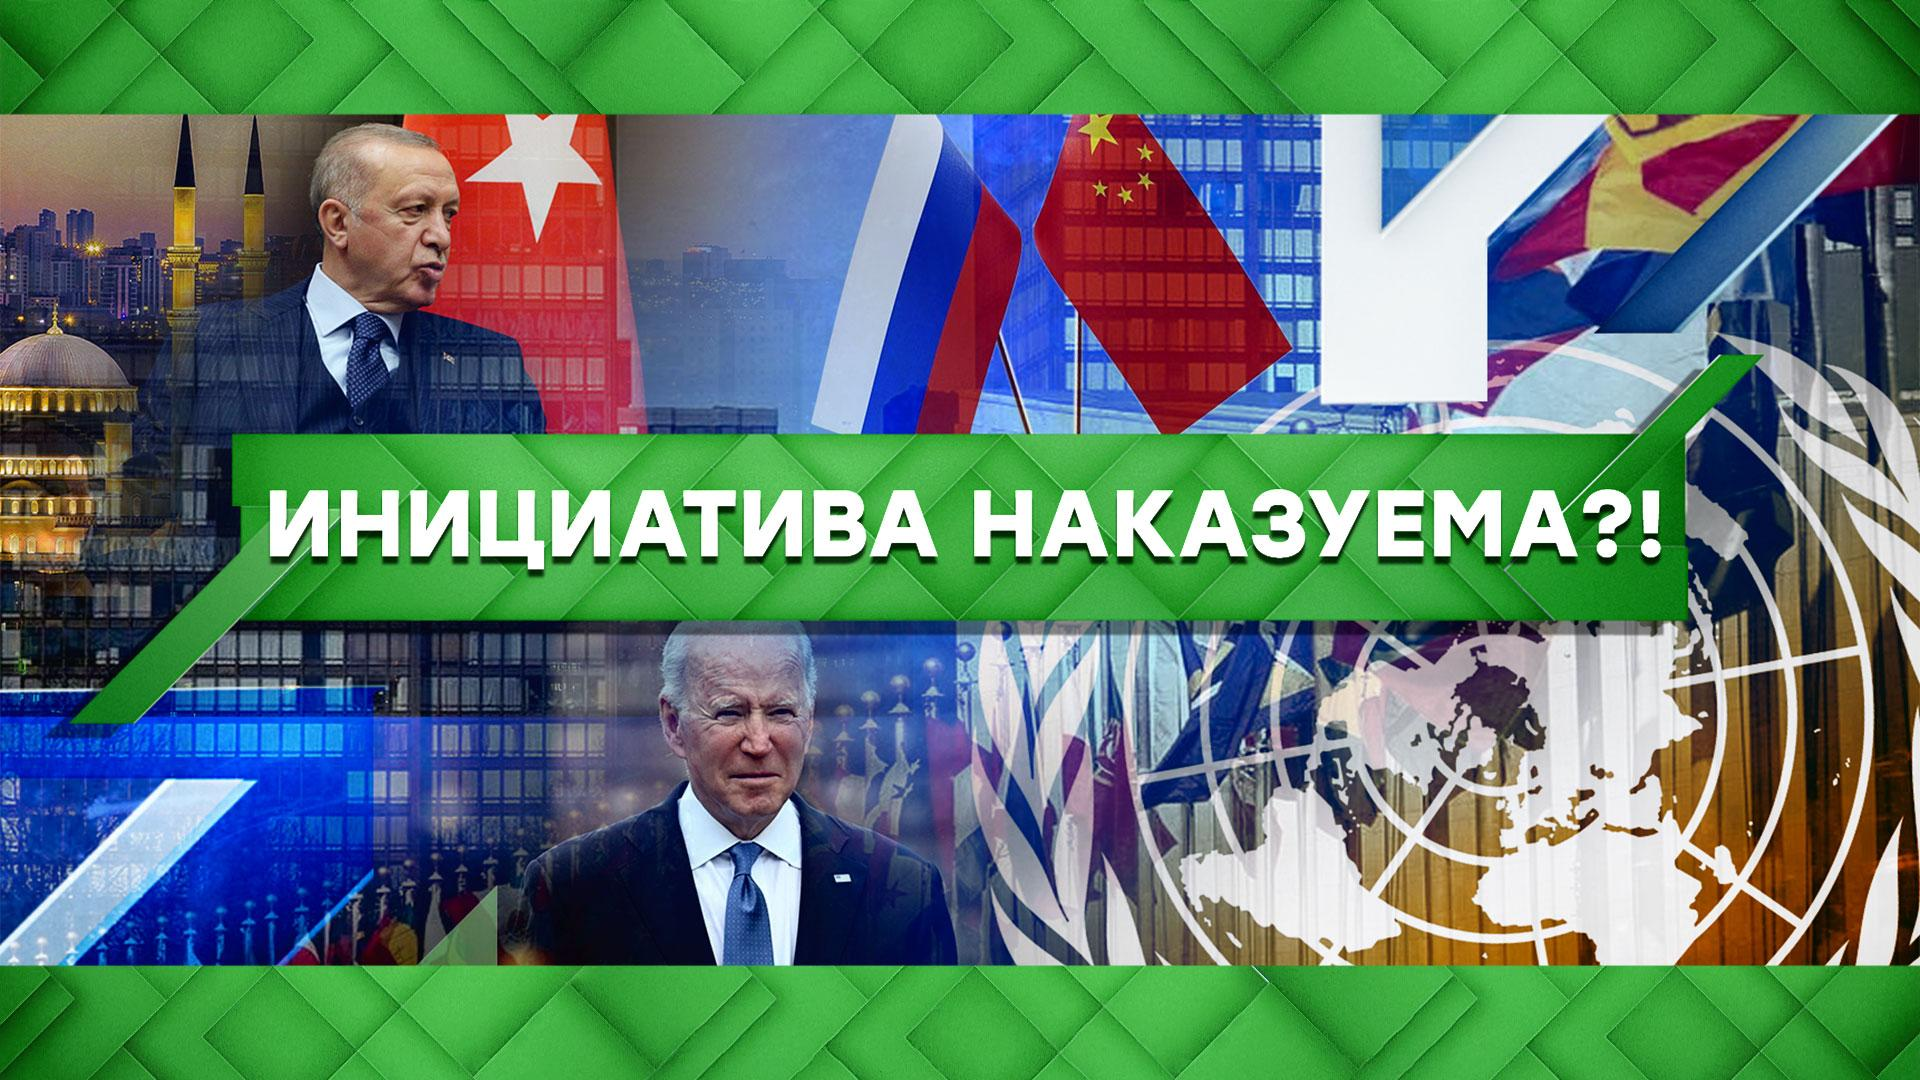 «Место встречи»: Инициатива наказуема?! | Общественно-политическое ток-шоу НТВ